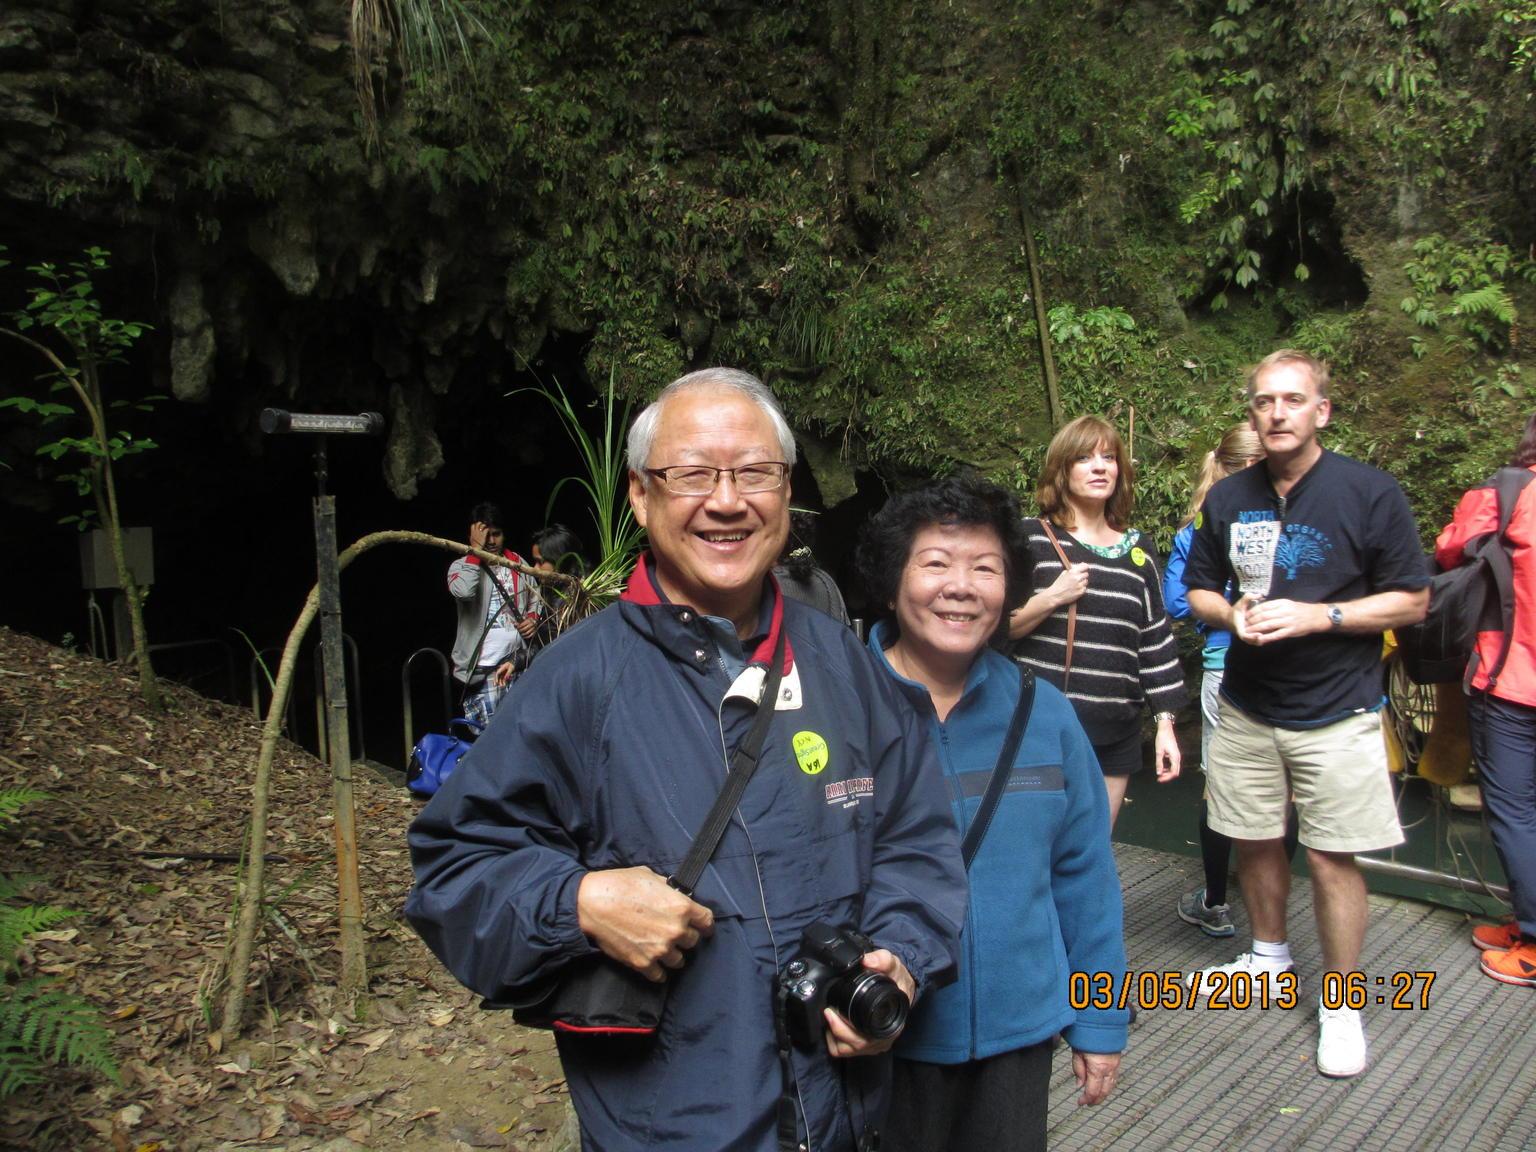 MORE PHOTOS, Rotorua Full Day Tour: Waitomo Caves, Agrodome and Te Puia departs Auckland